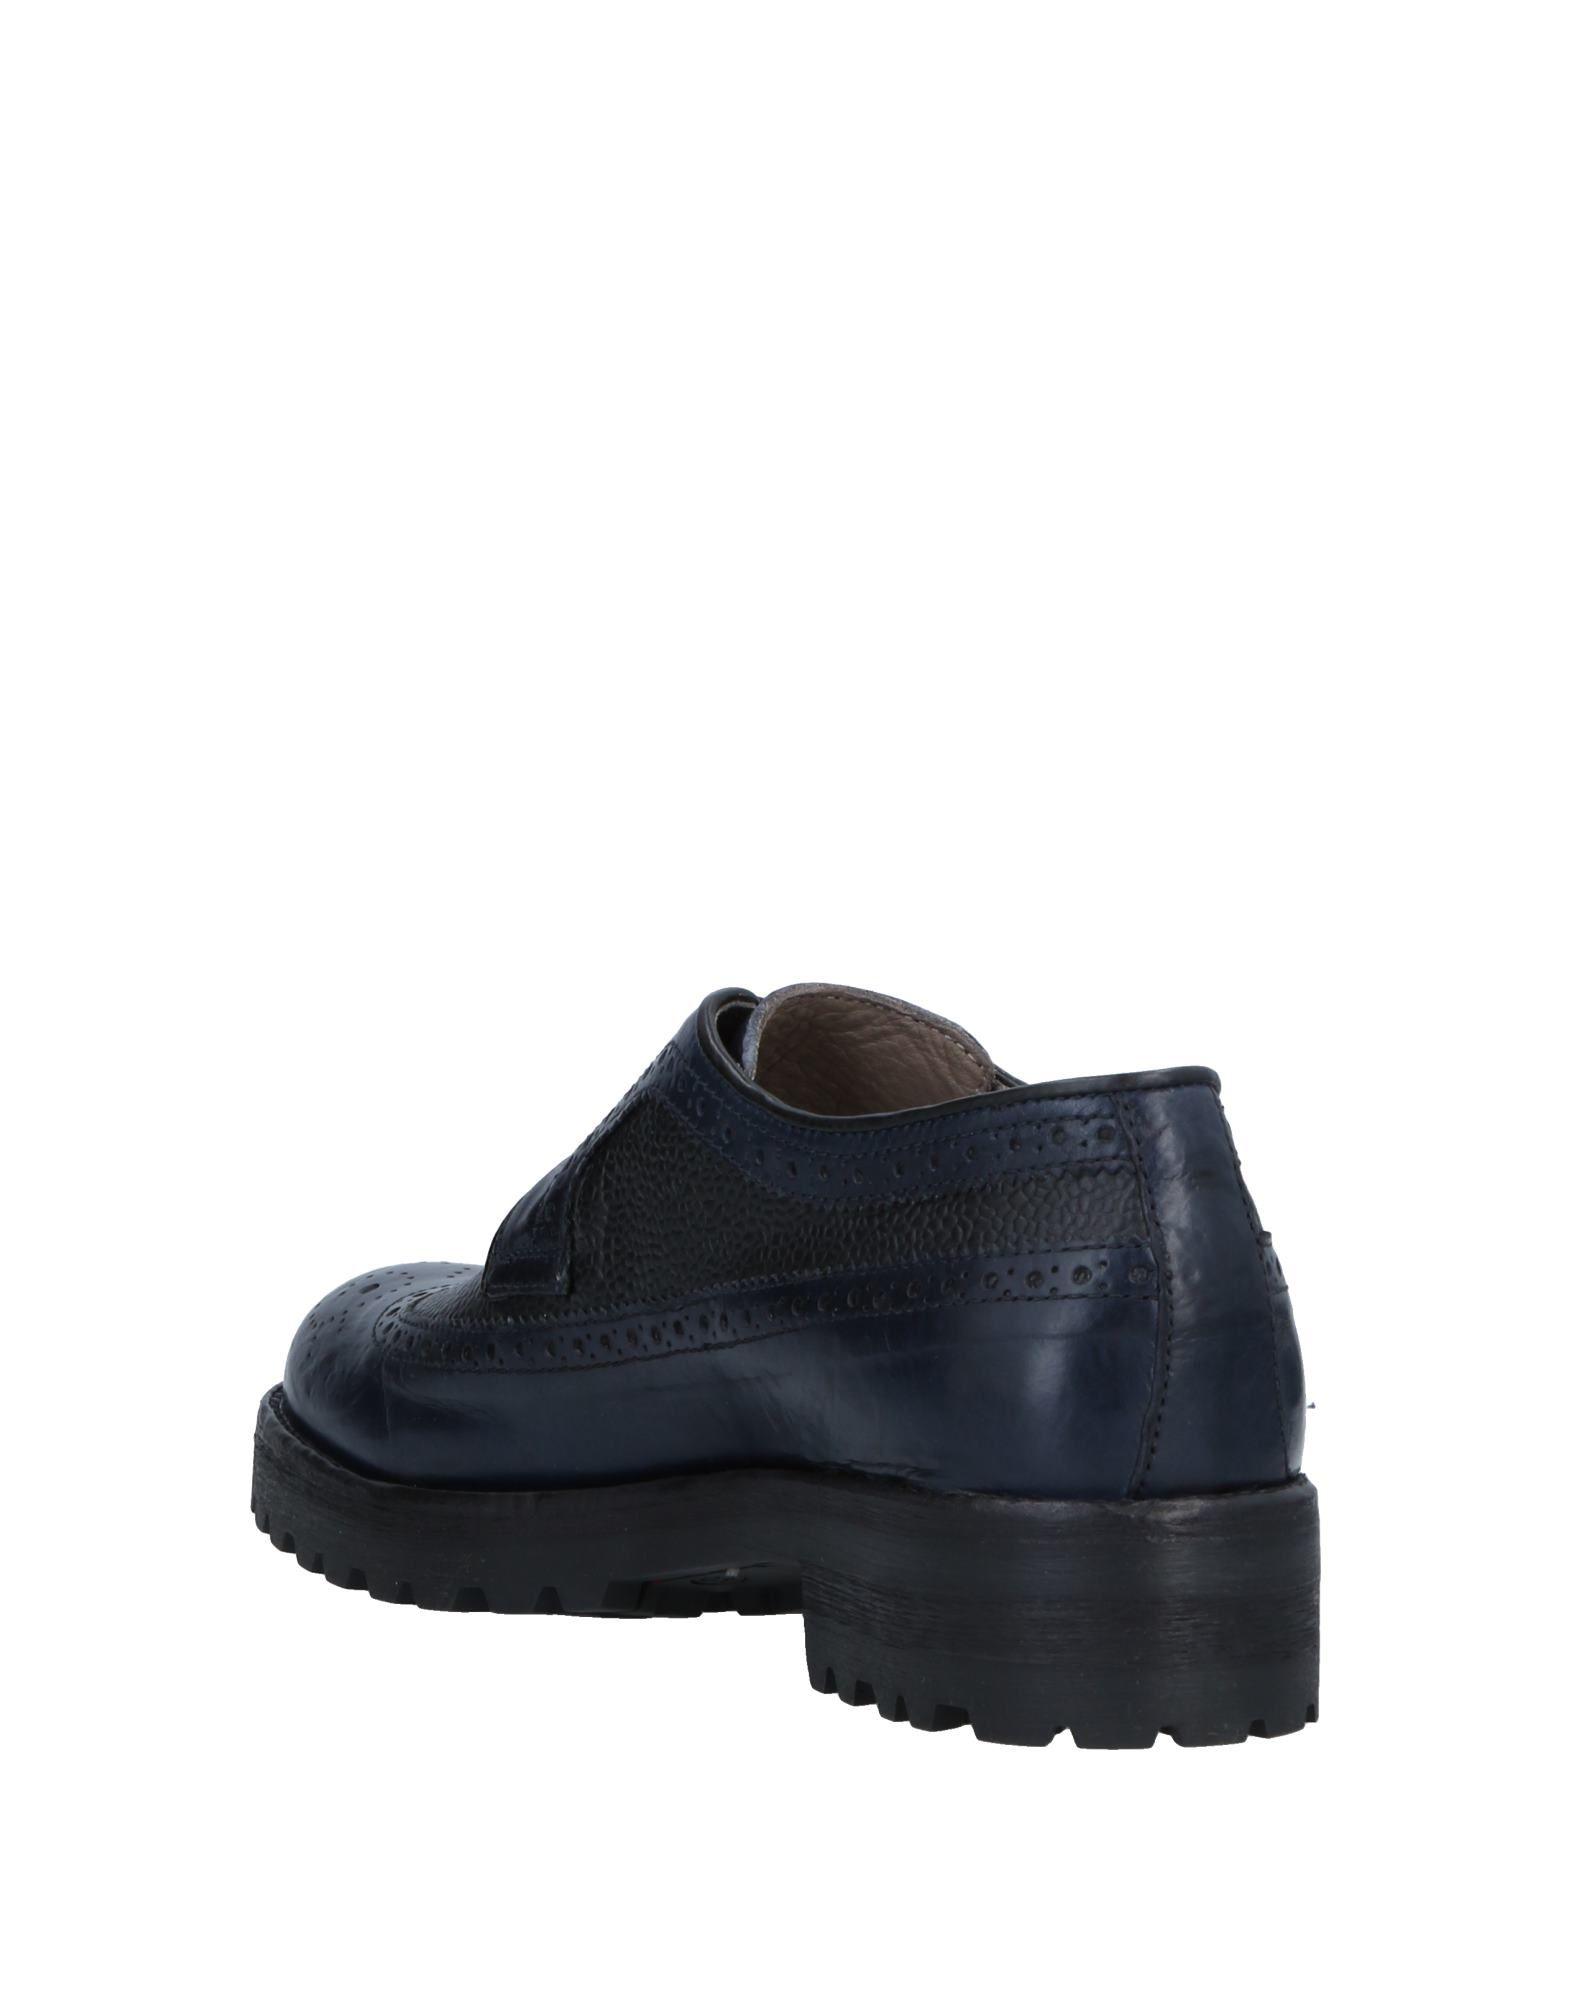 Gut um billige Damen Schuhe zu tragenCorvari Schnürschuhe Damen billige  11542856NH 7a0078